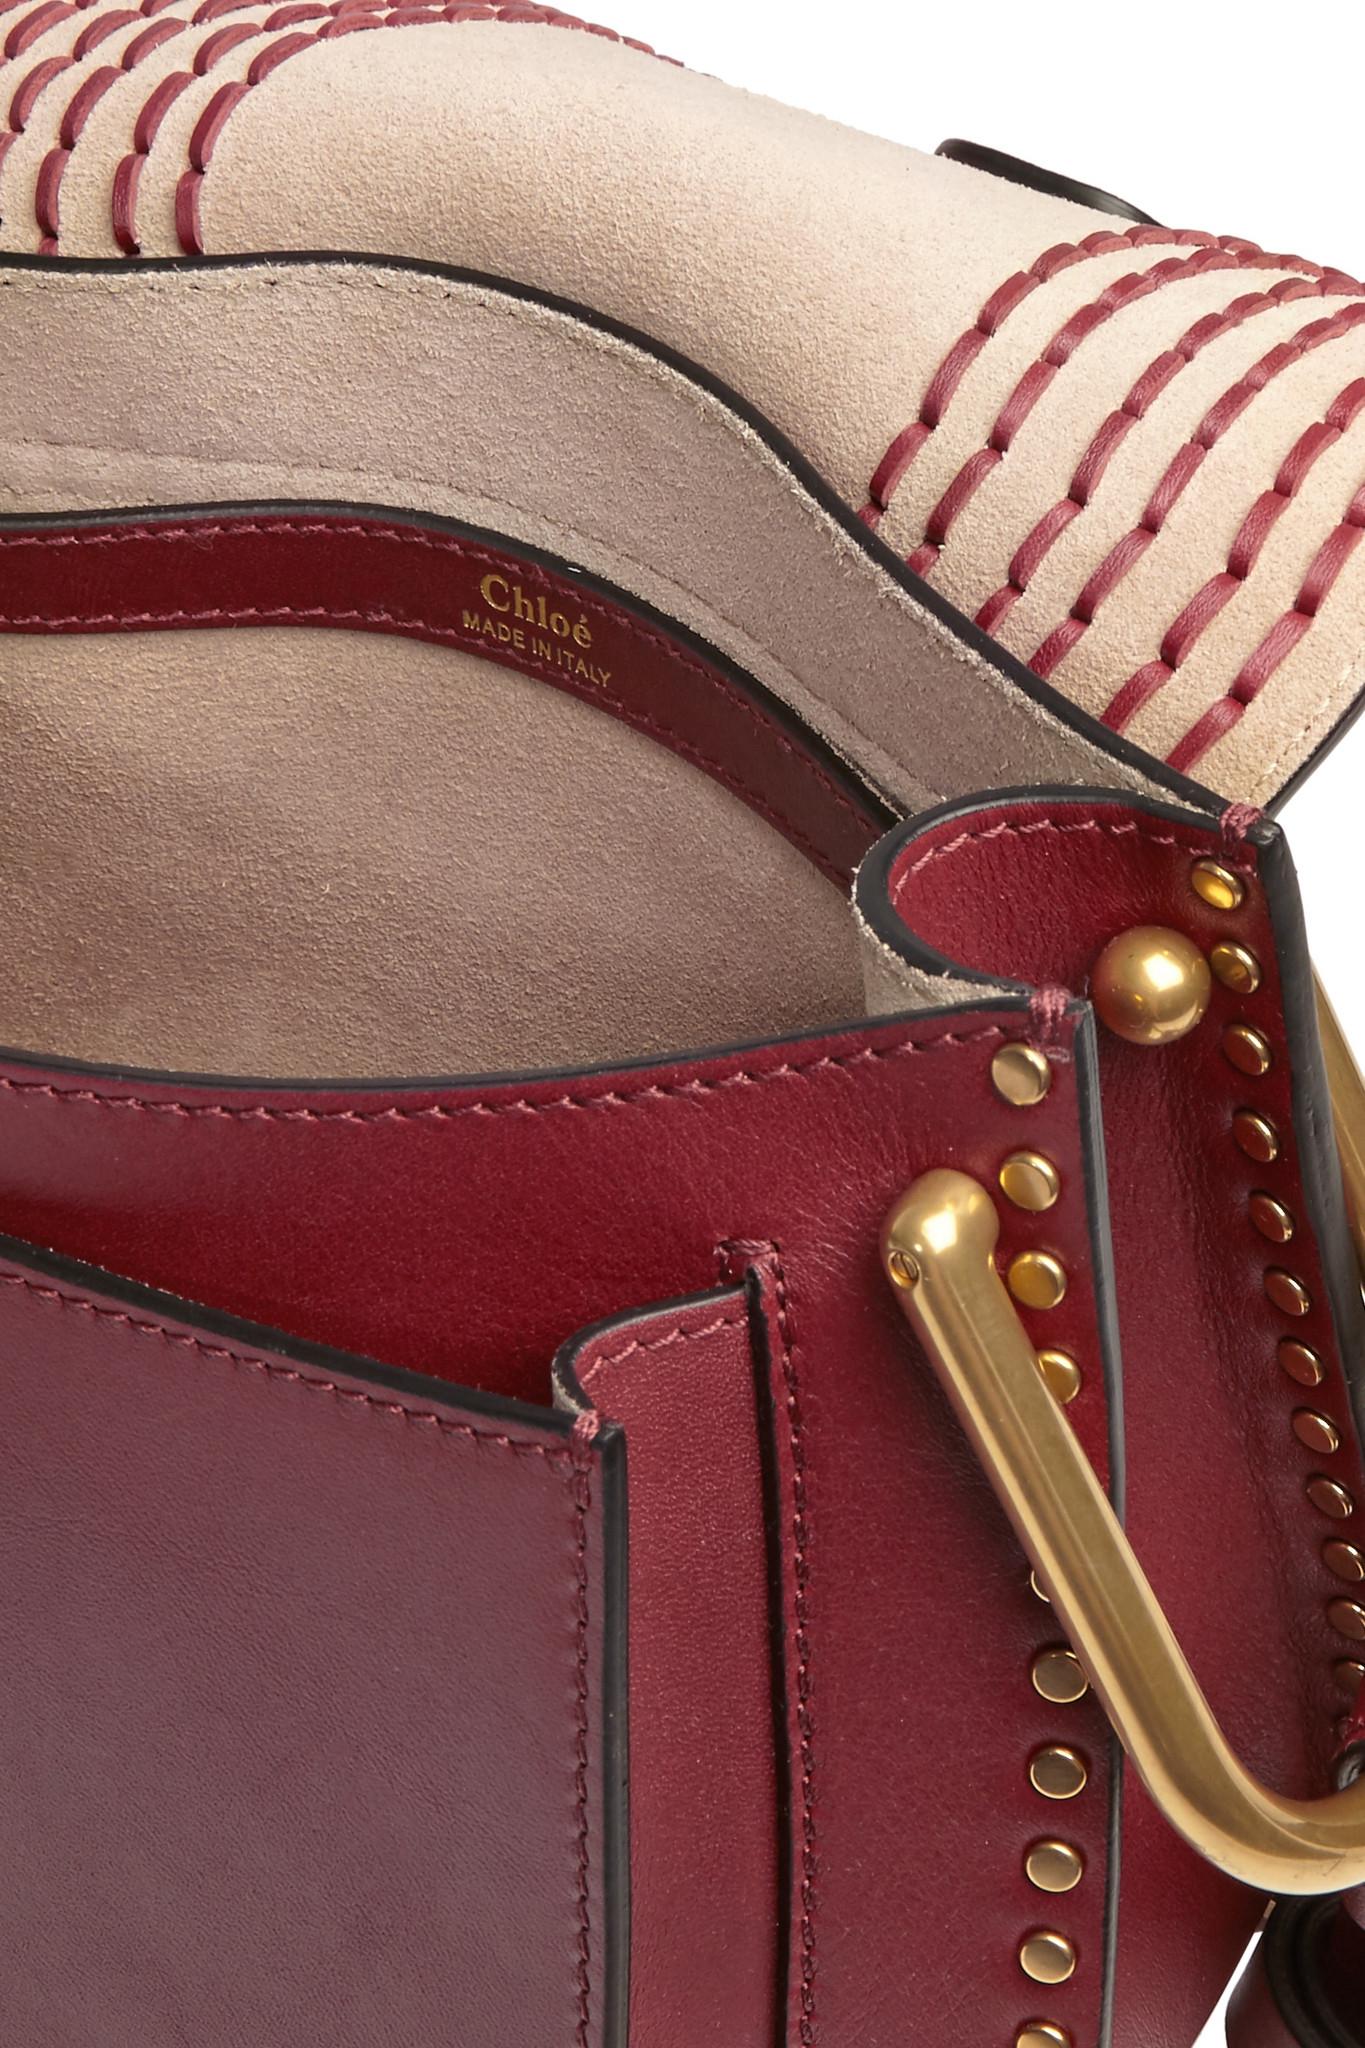 how to spot a fake chloe marcie bag - chloe hudson mini whipstitched leather shoulder bag, chloe satchel ...